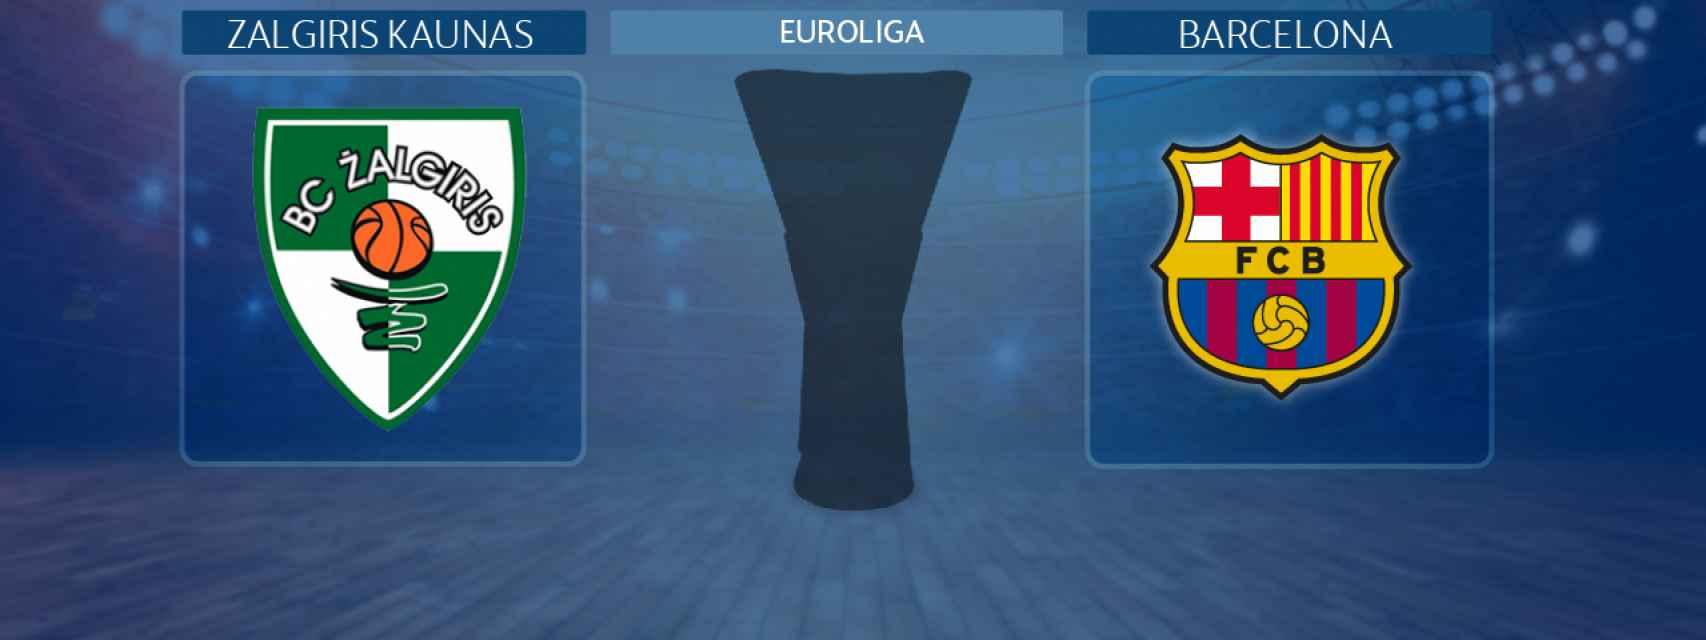 Zalgiris Kaunas - Barcelona, partido de la Euroliga